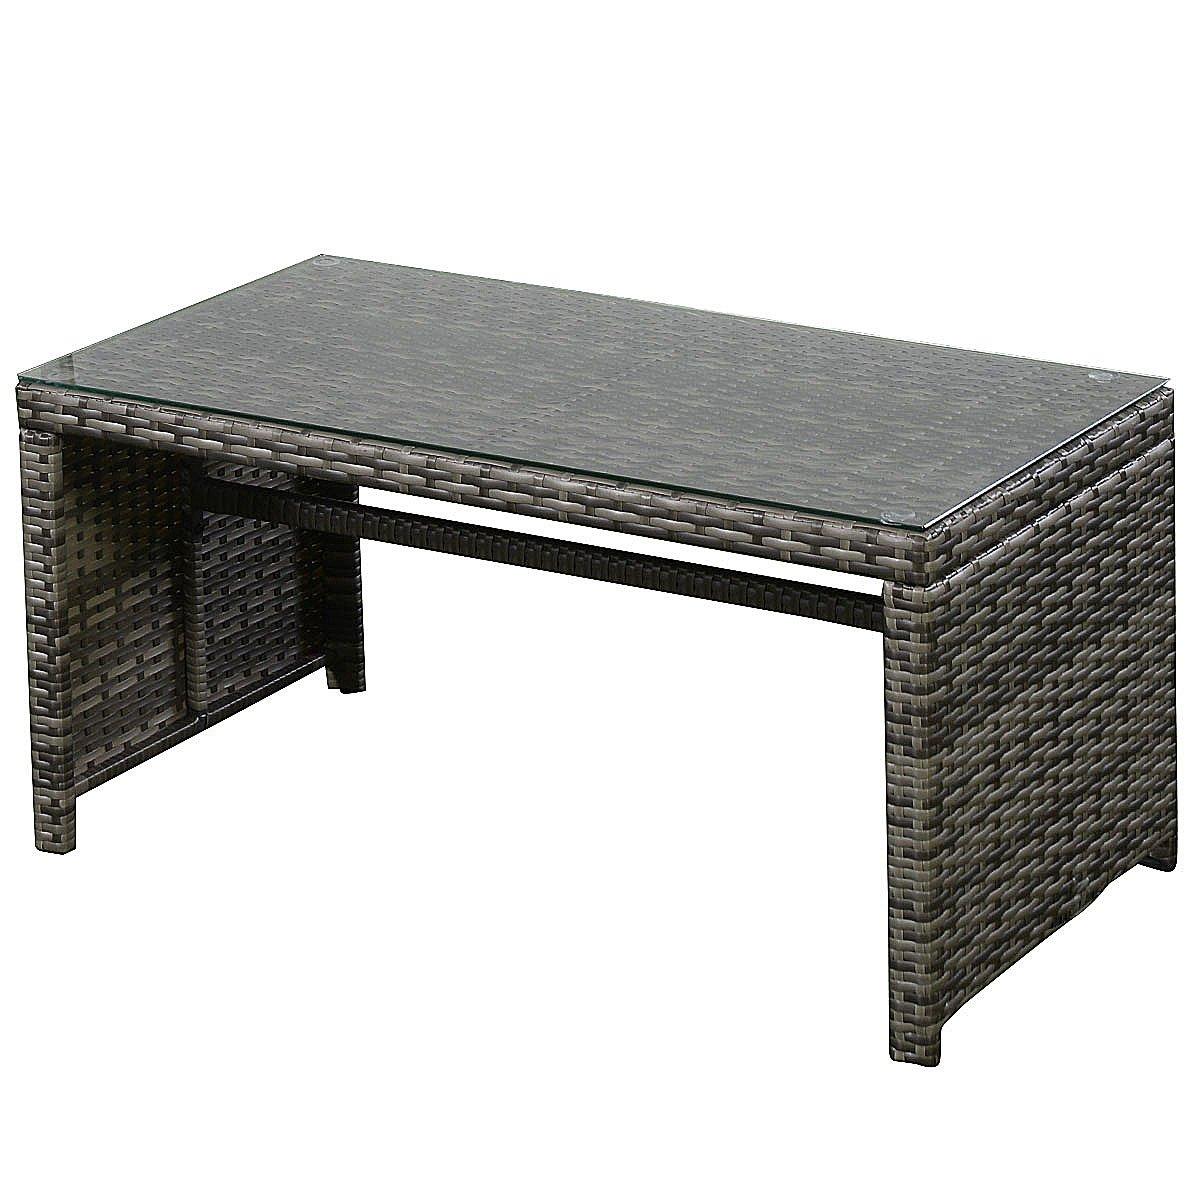 Goplus 4 PC Rattan Patio Furniture Set Garden Lawn Sofa Cushioned Seat Wicker Sofa (Mix Gray) by Goplus (Image #9)